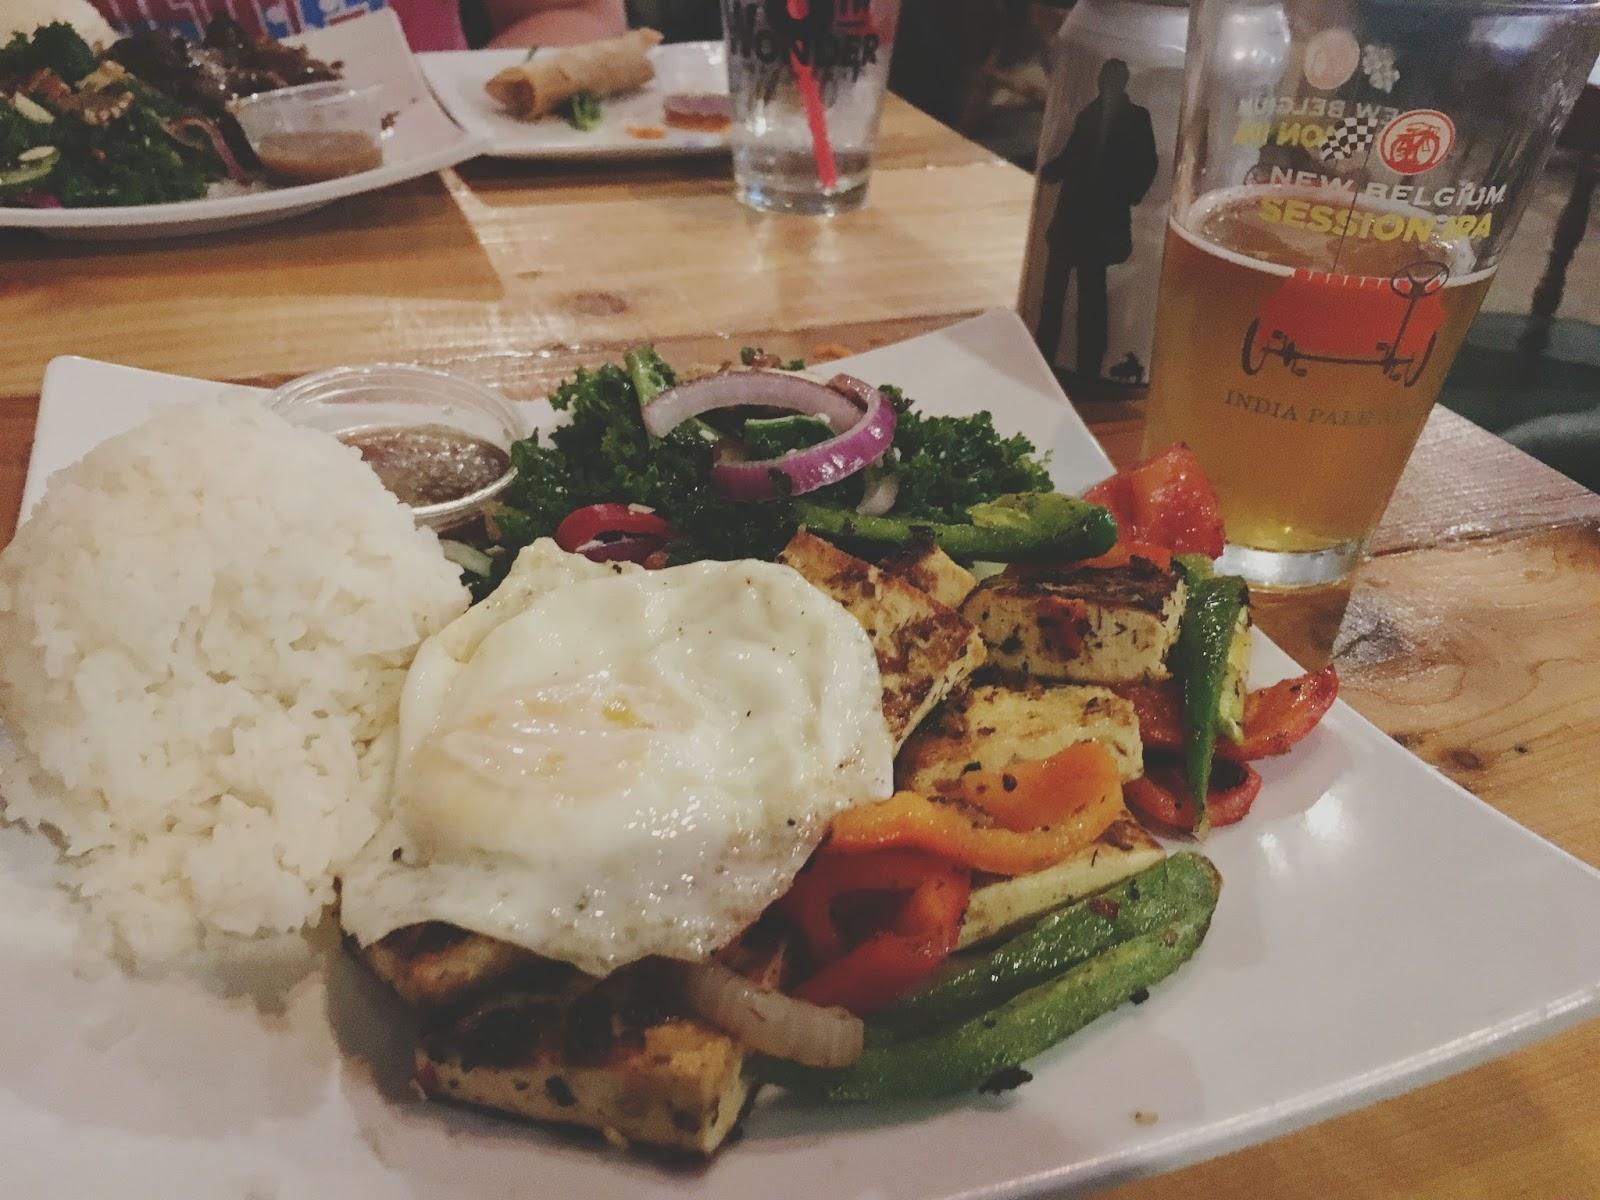 lemongrass tofu at Hughie's - A restaurant/bar in Houston, Texas